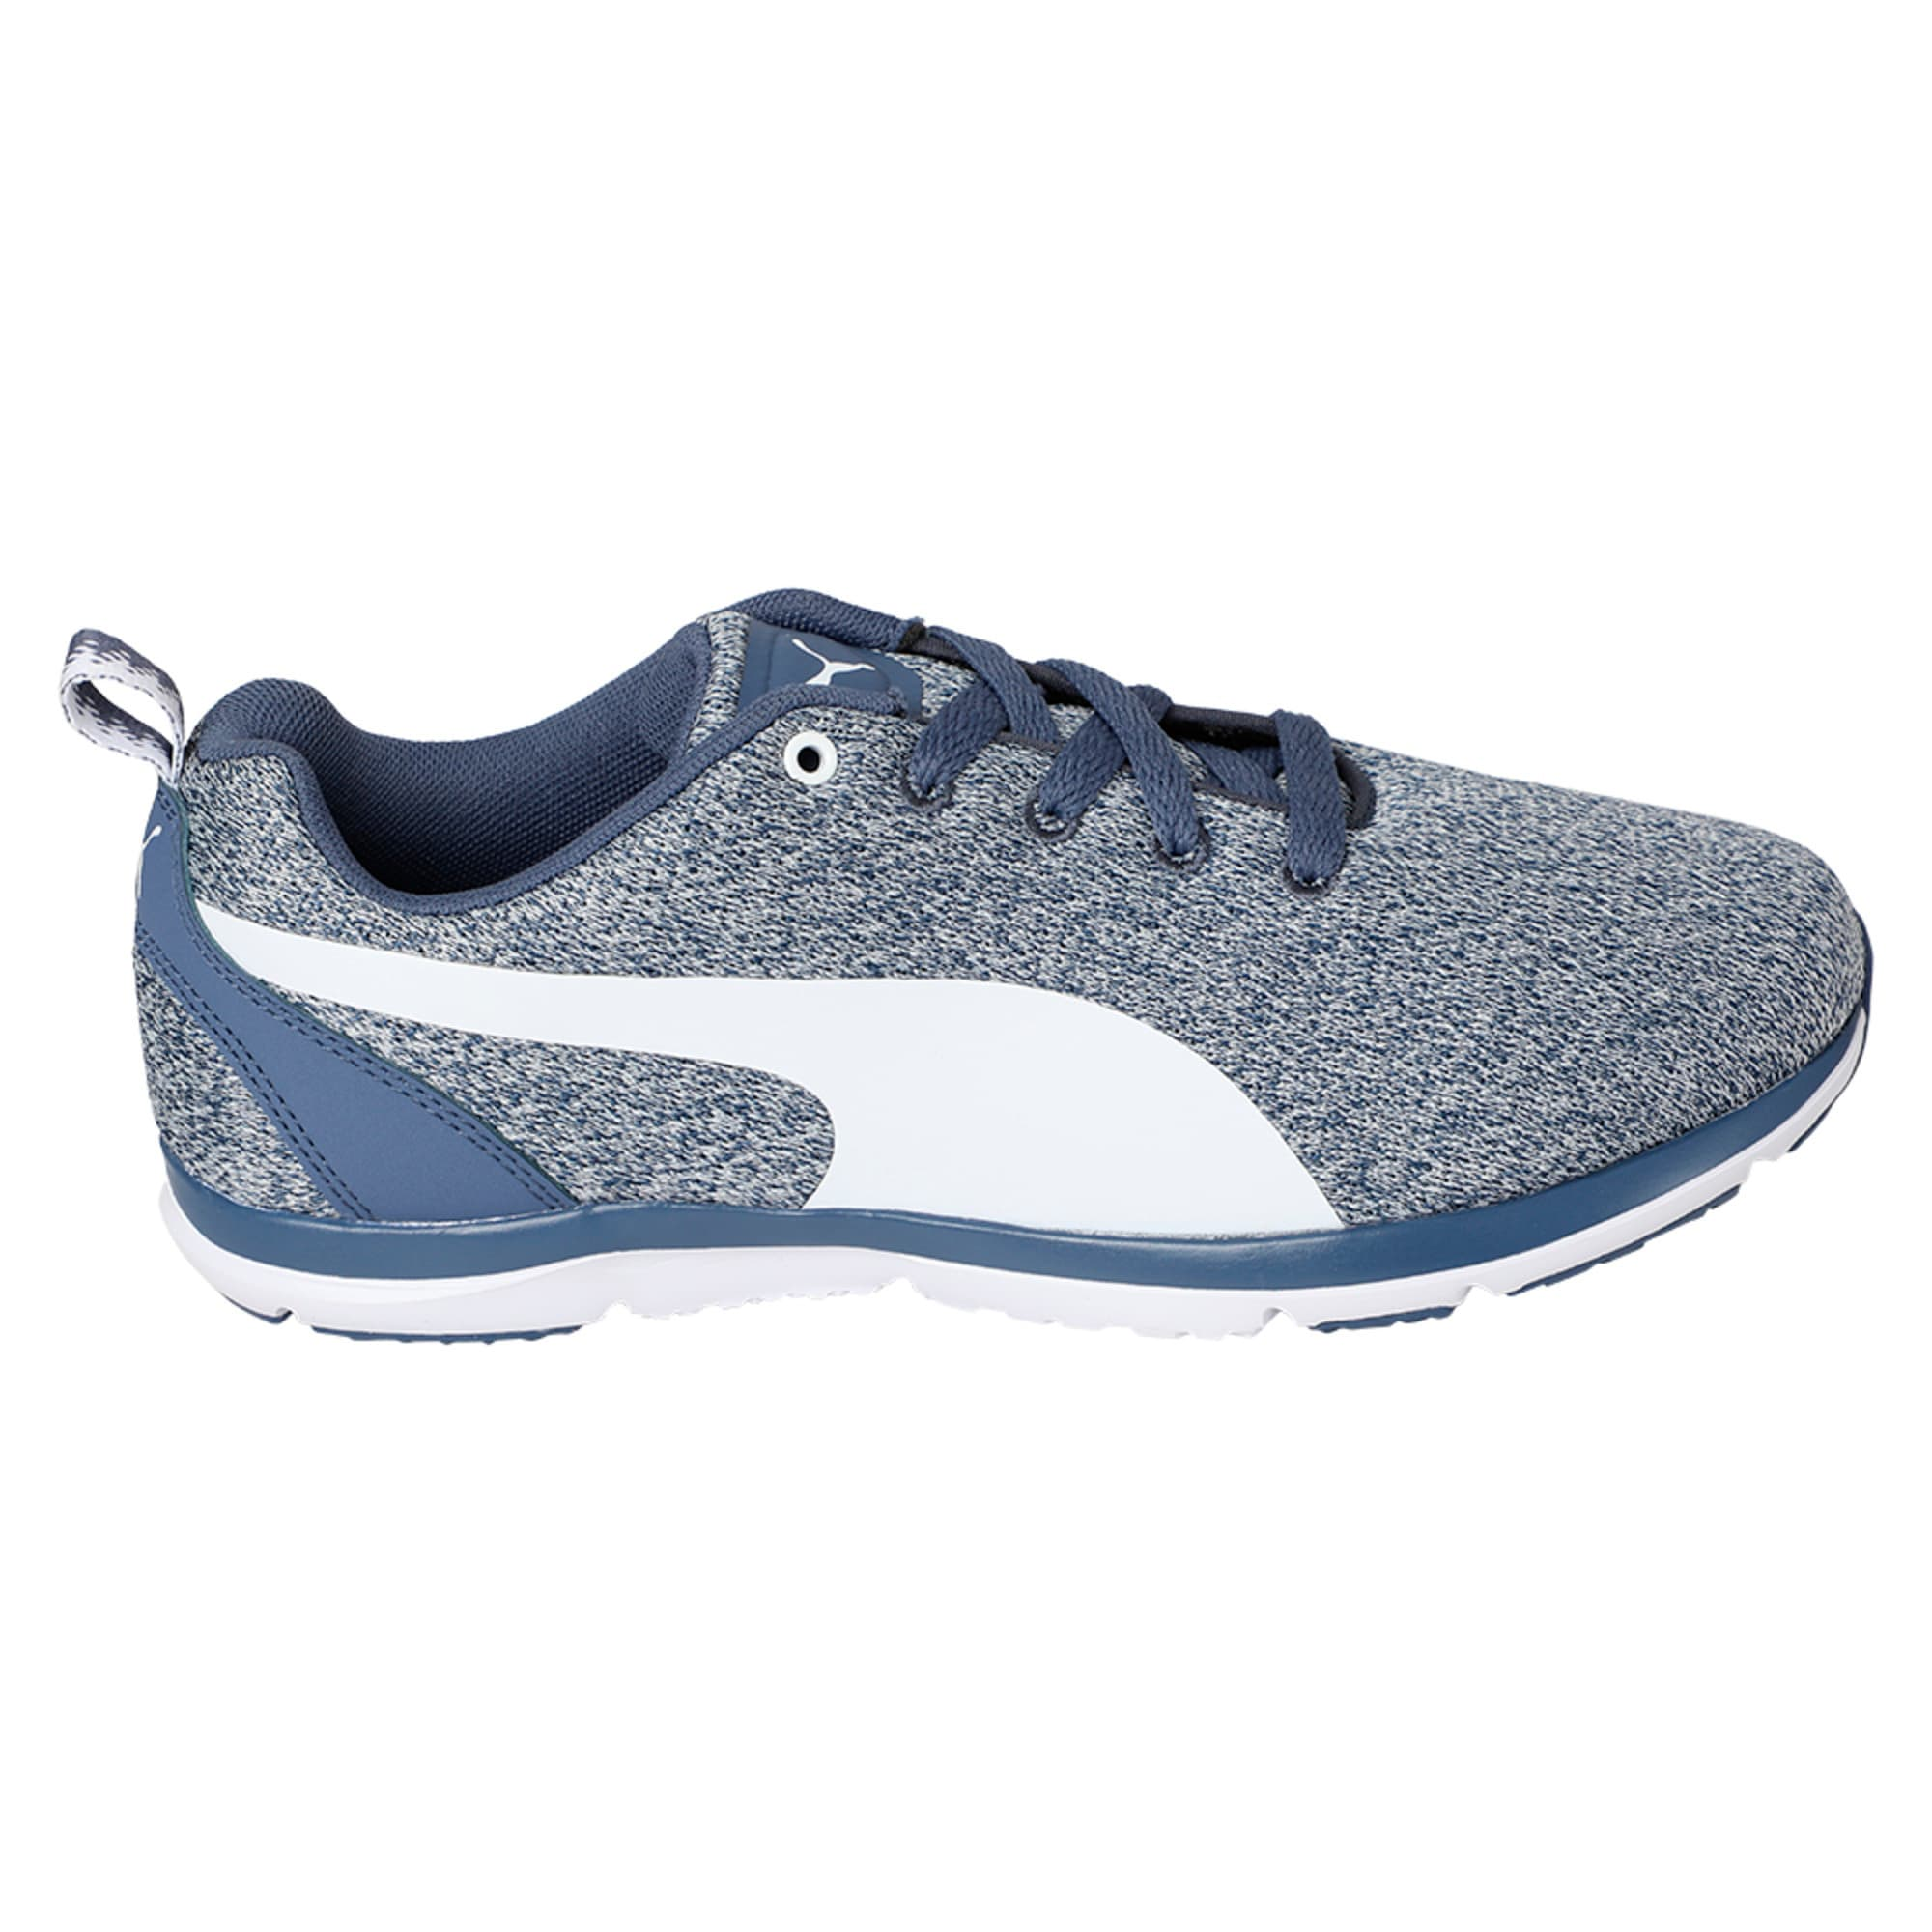 Thumbnail 5 of Flex XT Knit Women's Training Shoes, Blue Indigo-Puma White, medium-IND